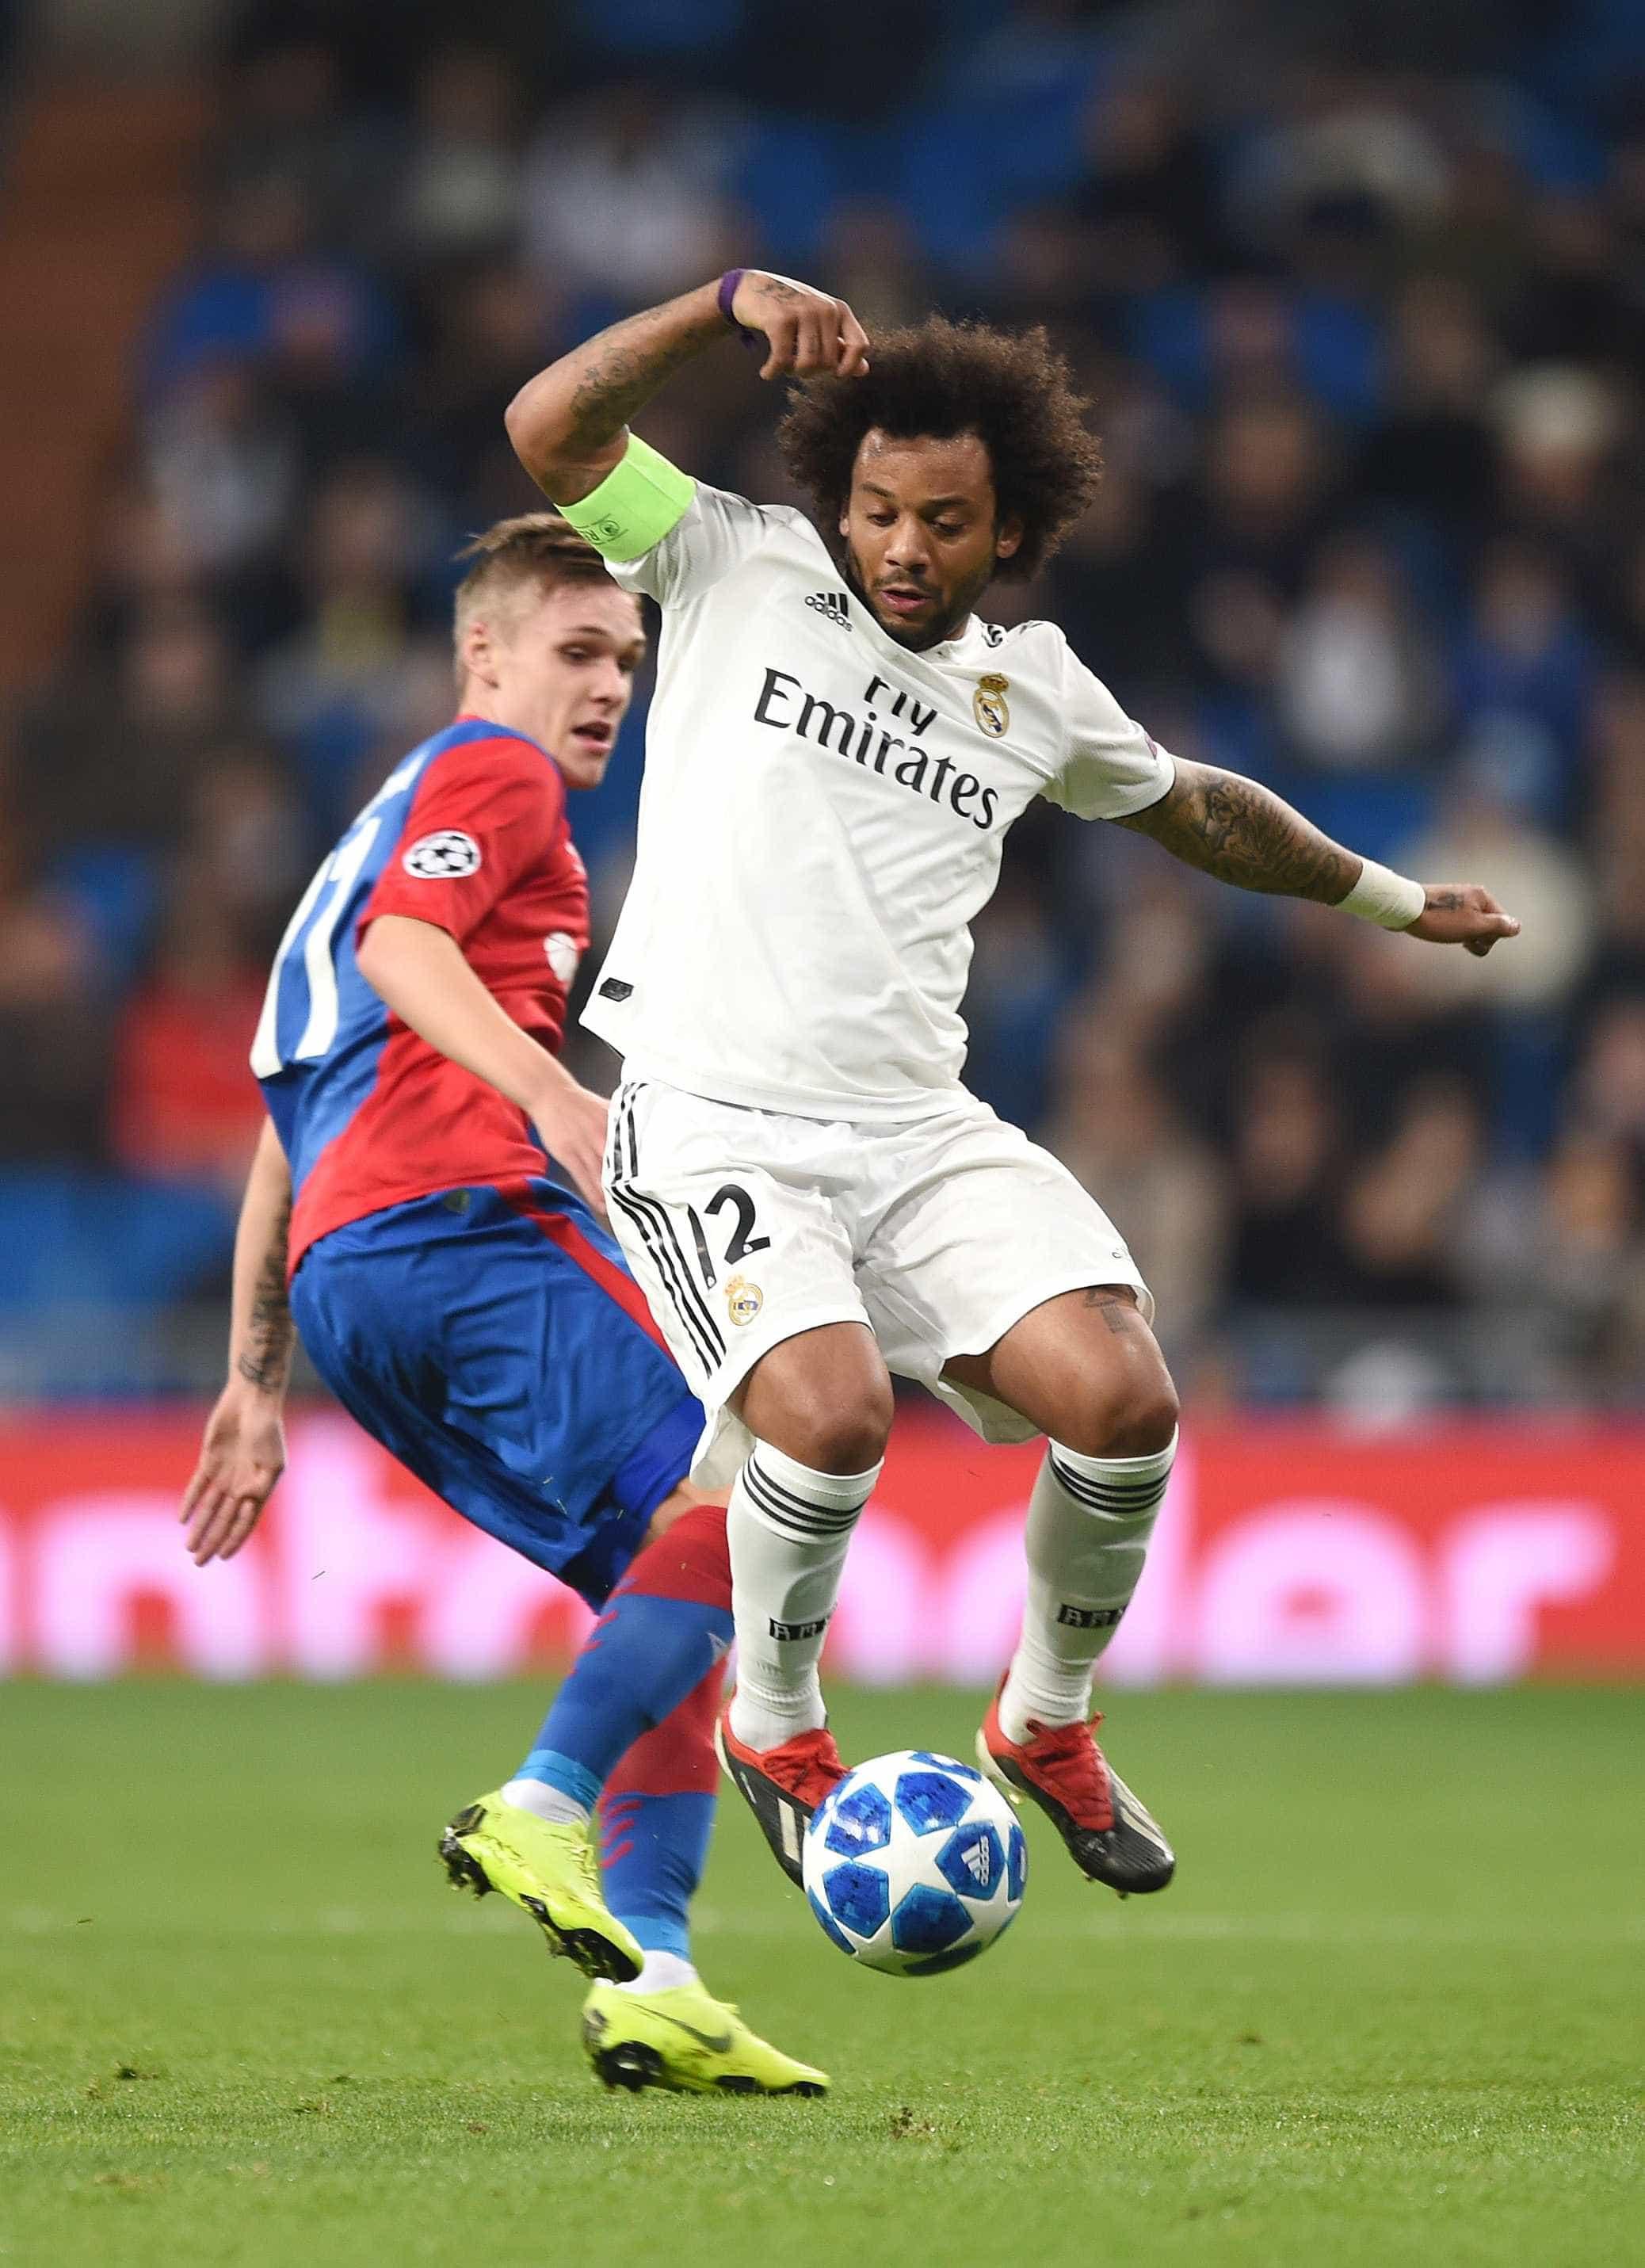 Marcelo descarta jogar com Cristiano Ronaldo na Juventus